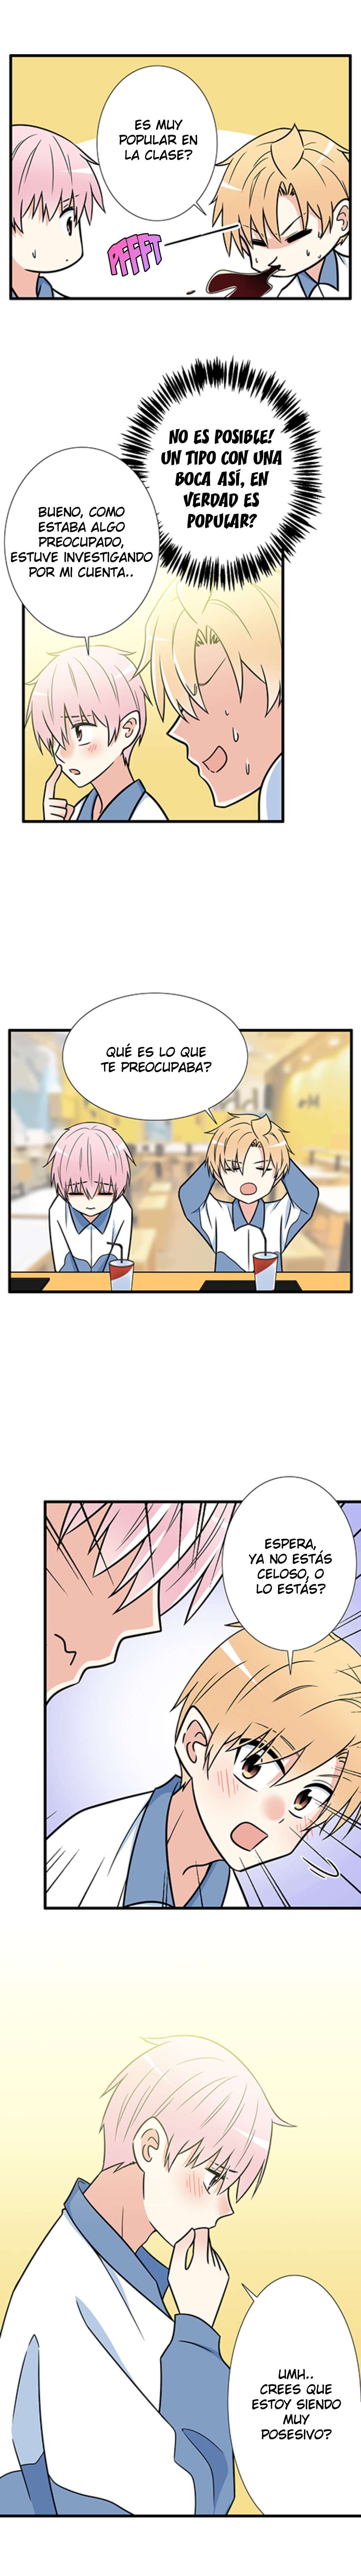 https://nimg.taadd.com/manga3/49/10018032/100194903/2859131_202010183077.jpg Page 1